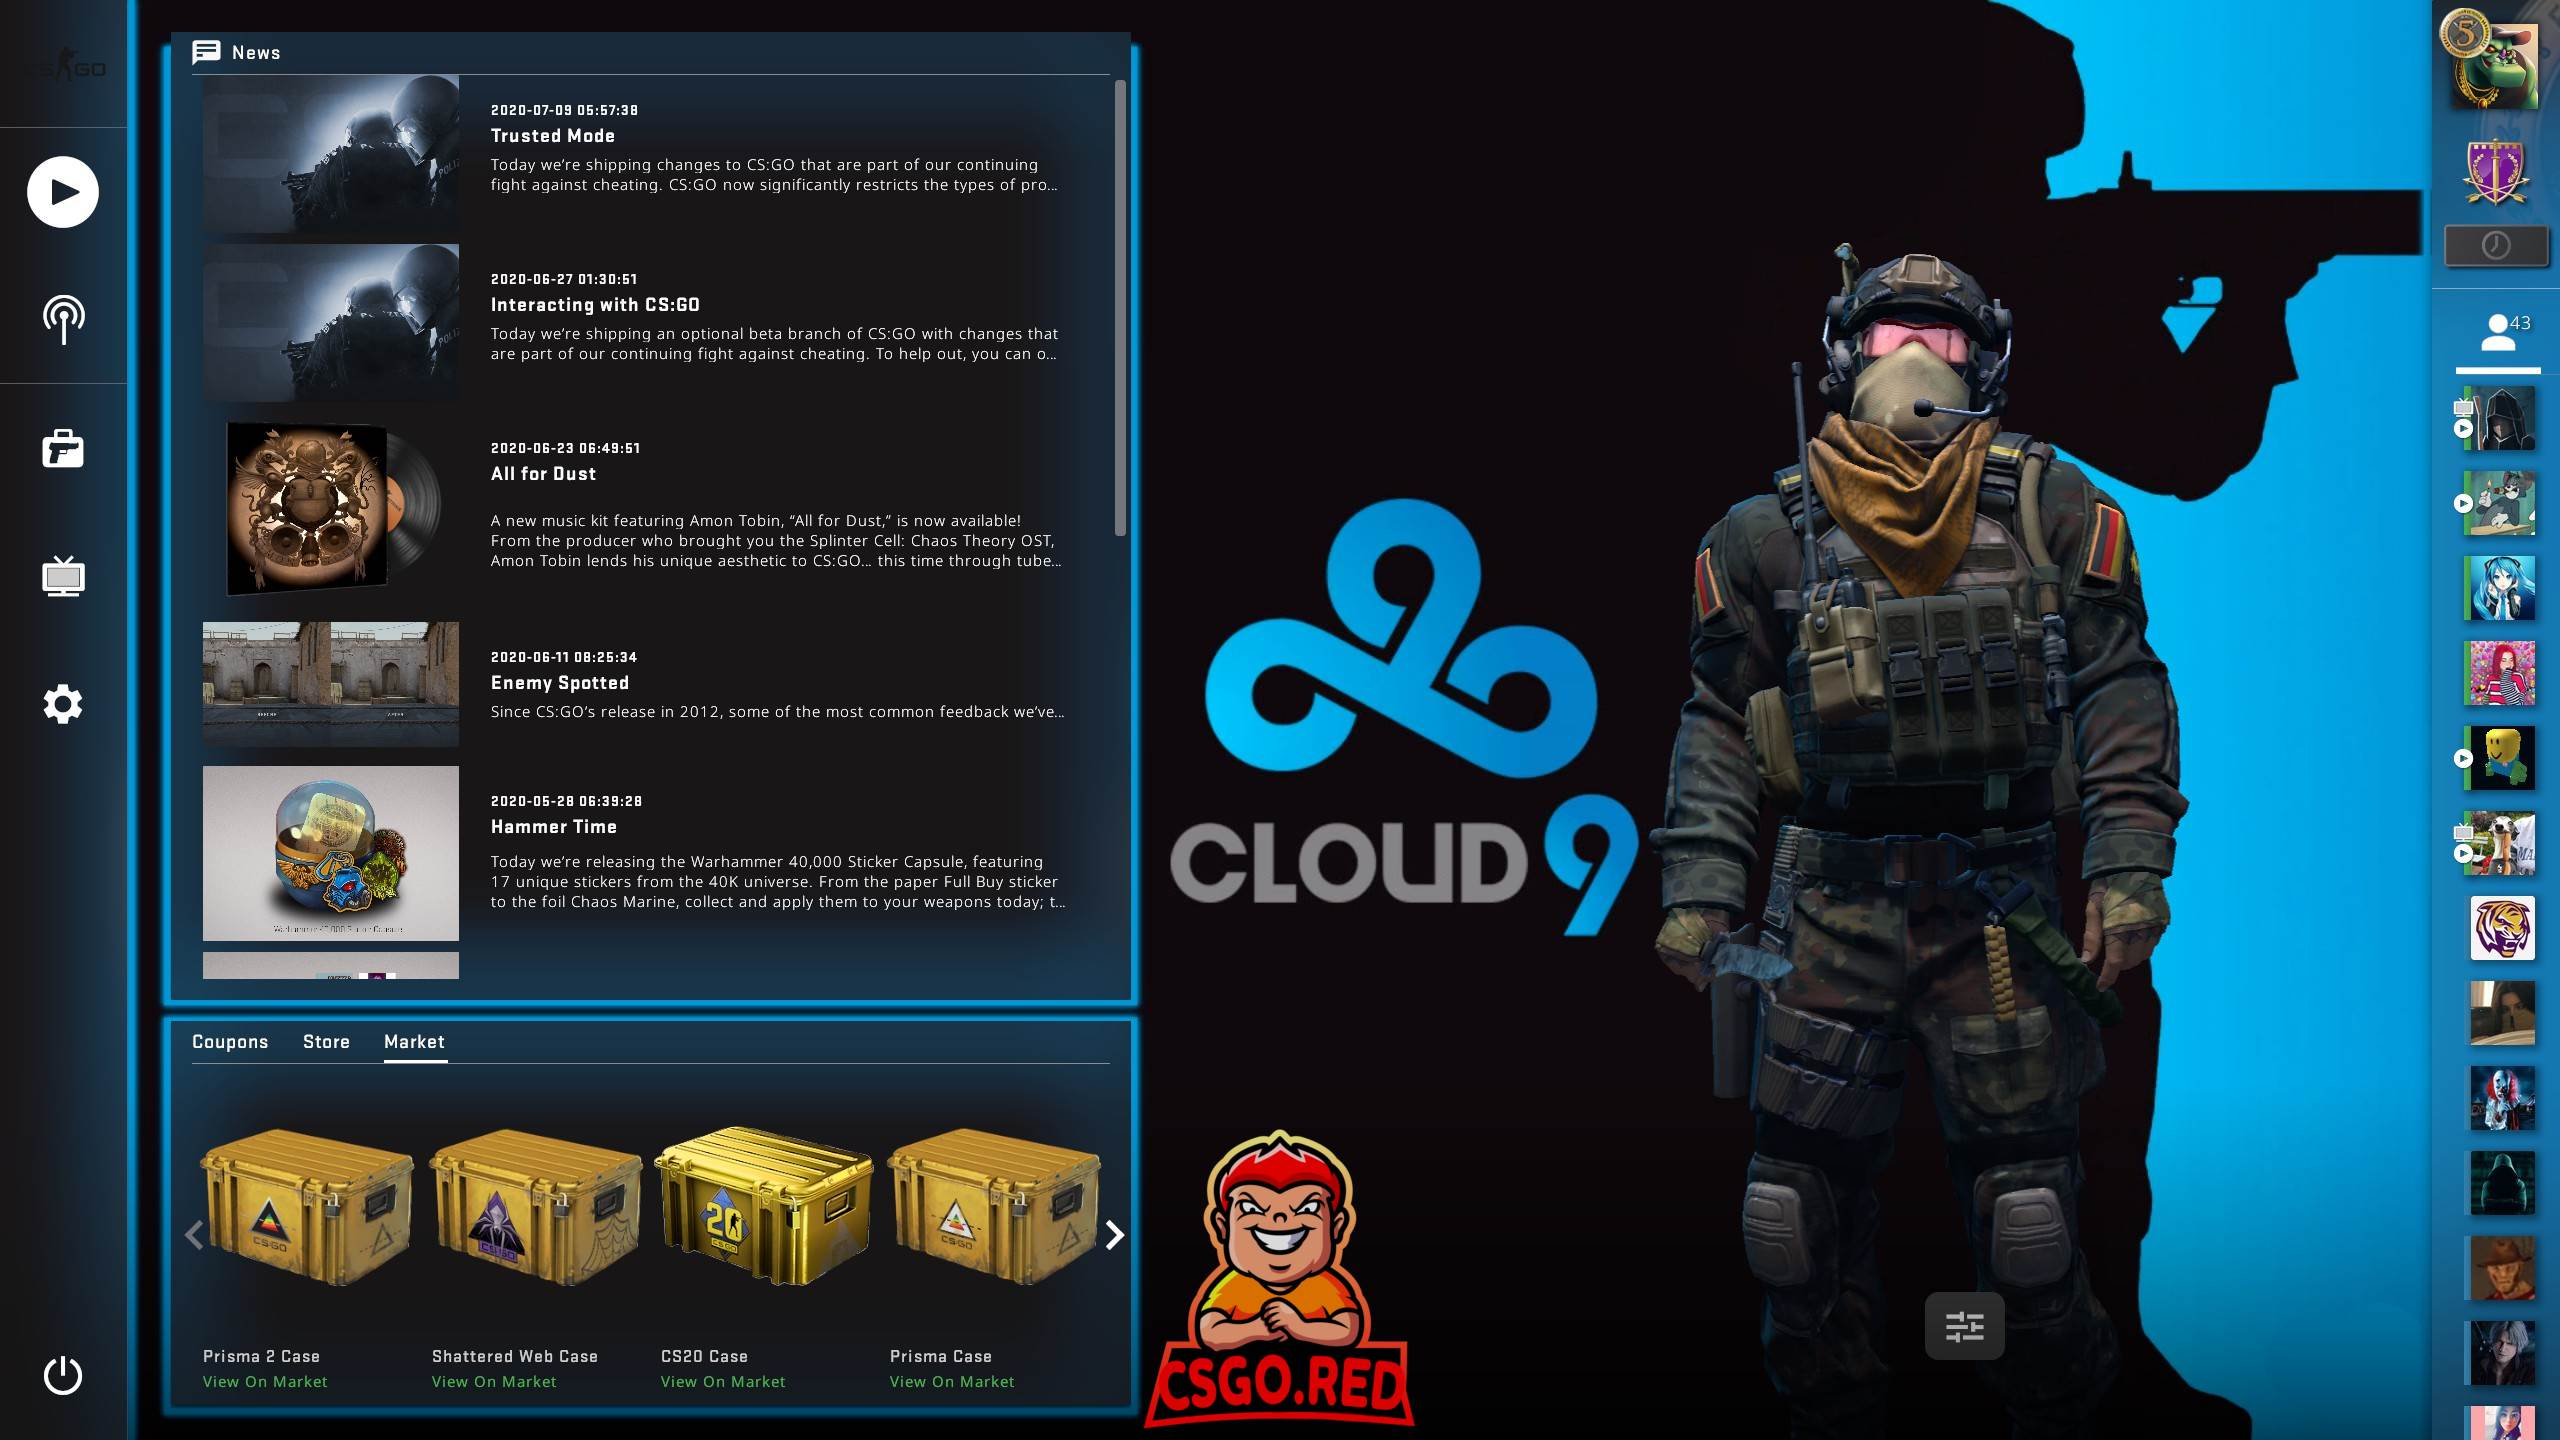 Cloud9 Panorama UI Background